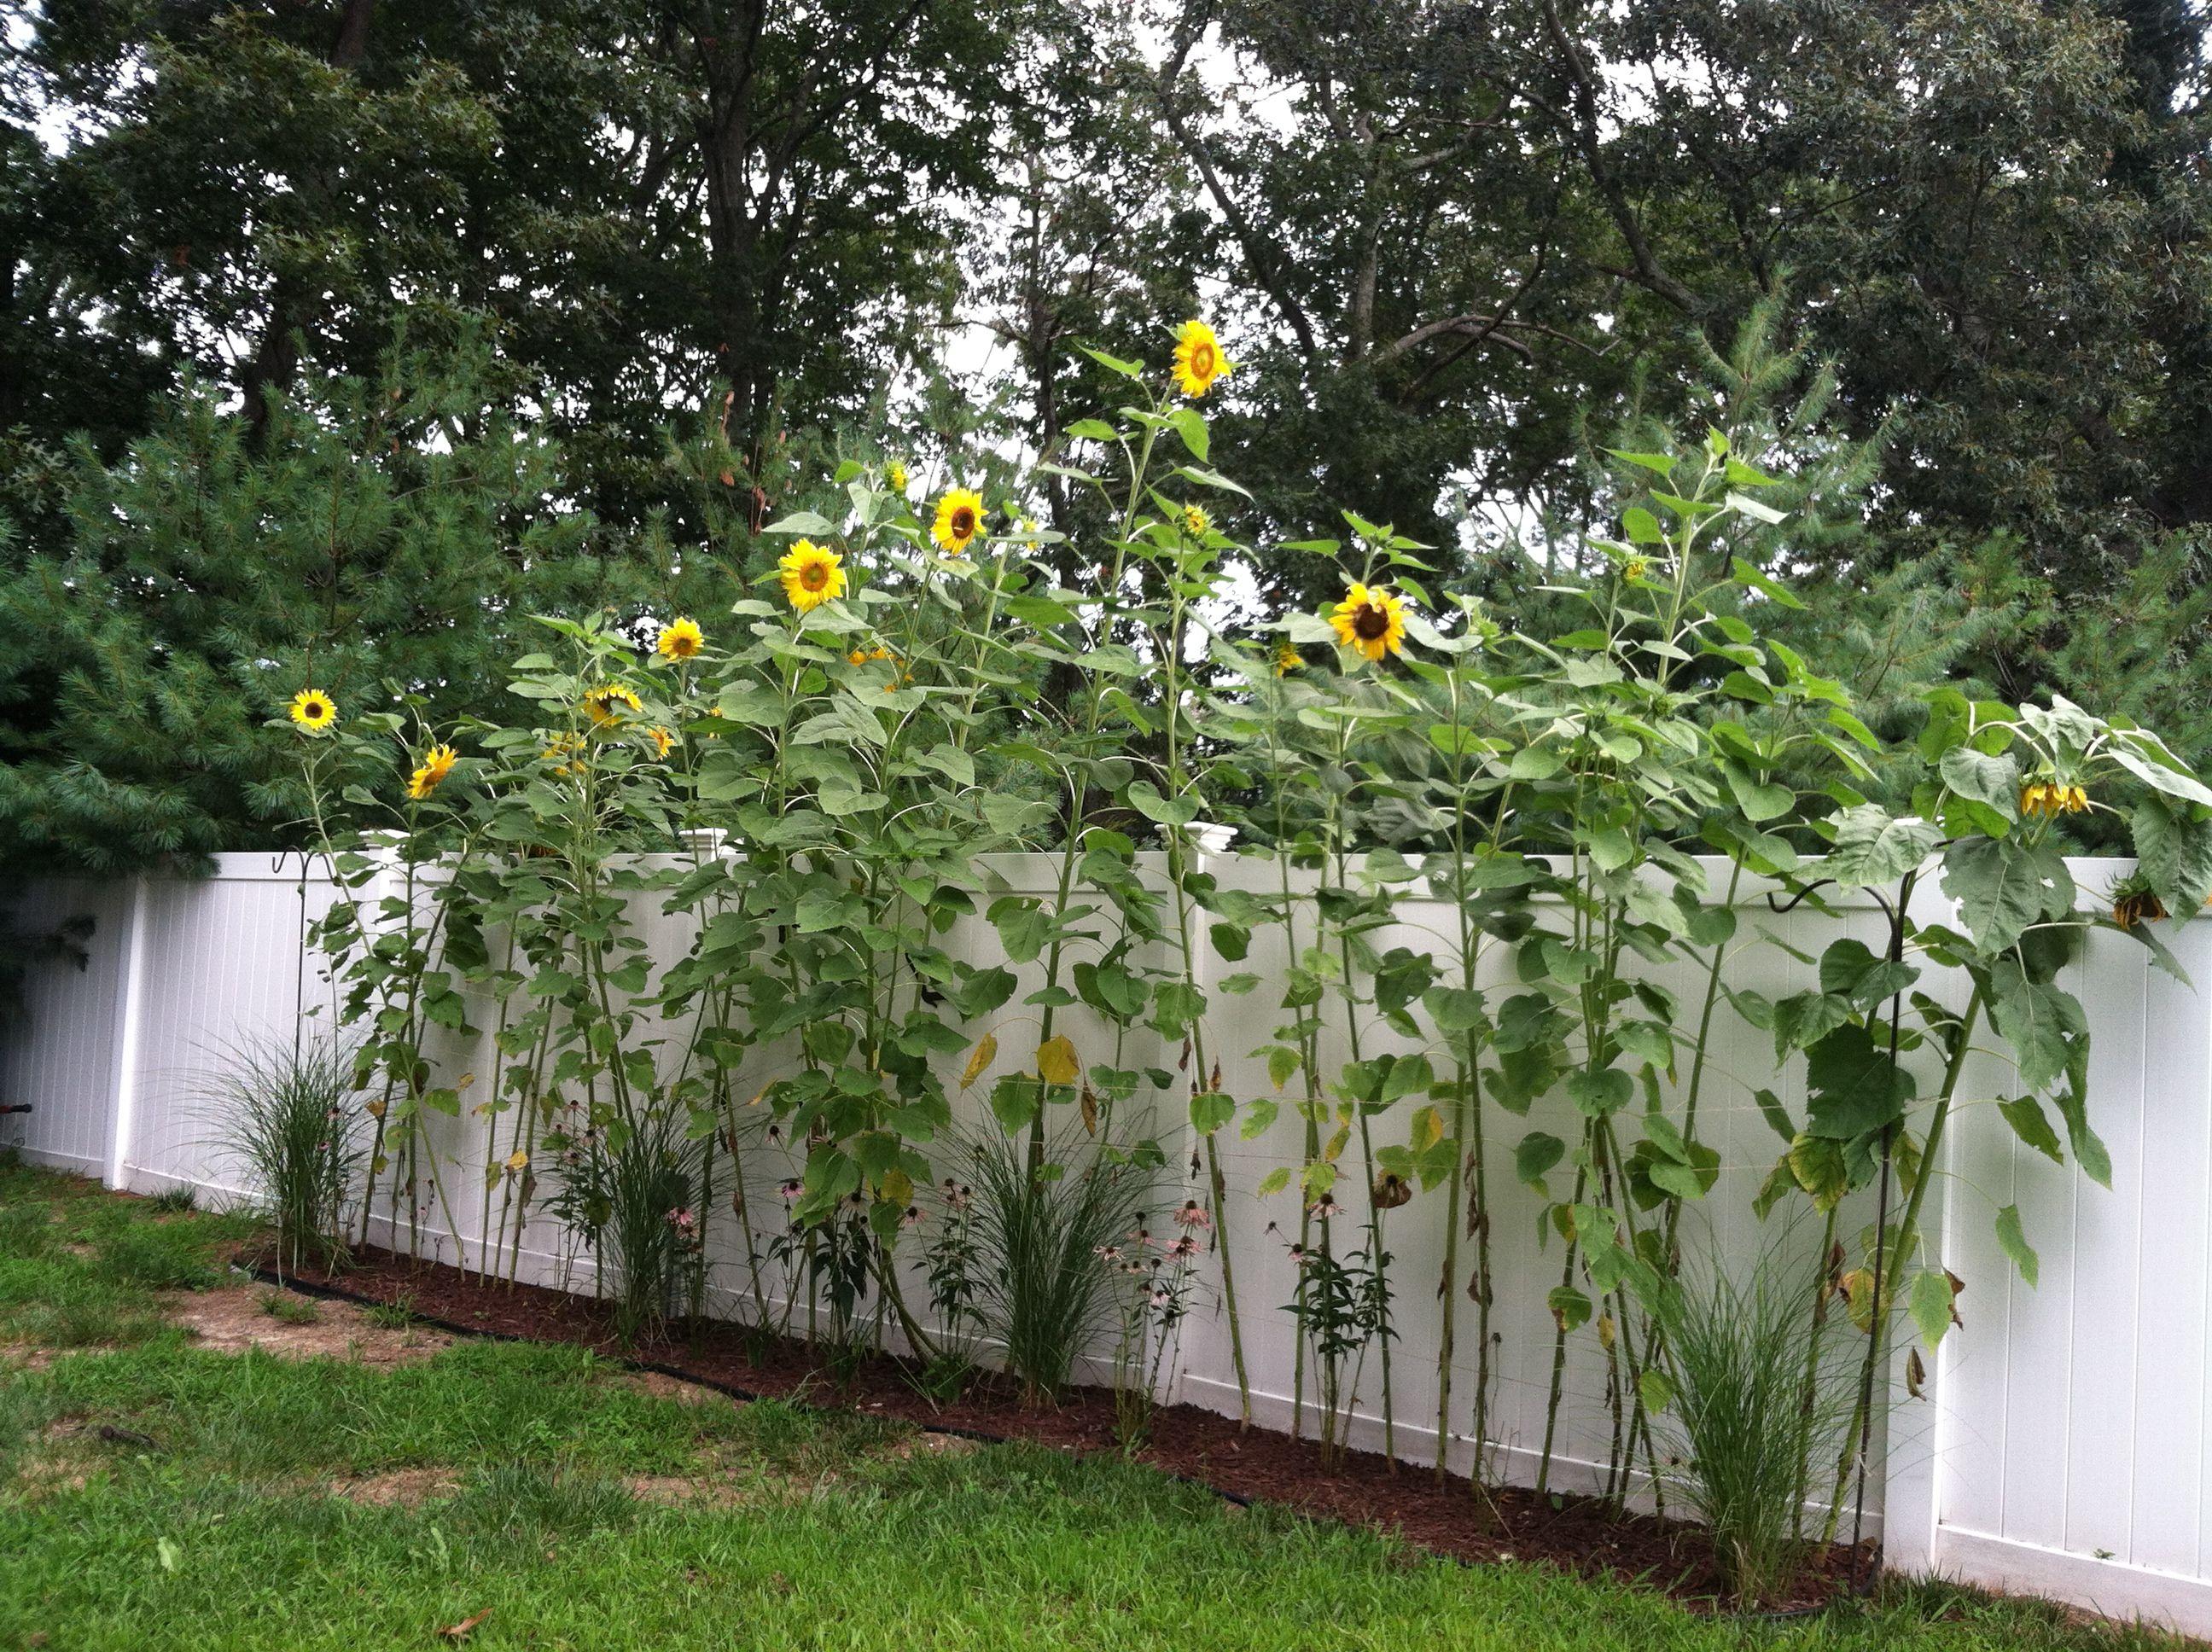 Sunflower Garden Ideas sunny sunflower seed mix sunflower seedssunflowersgarden ideas Garden Ideas